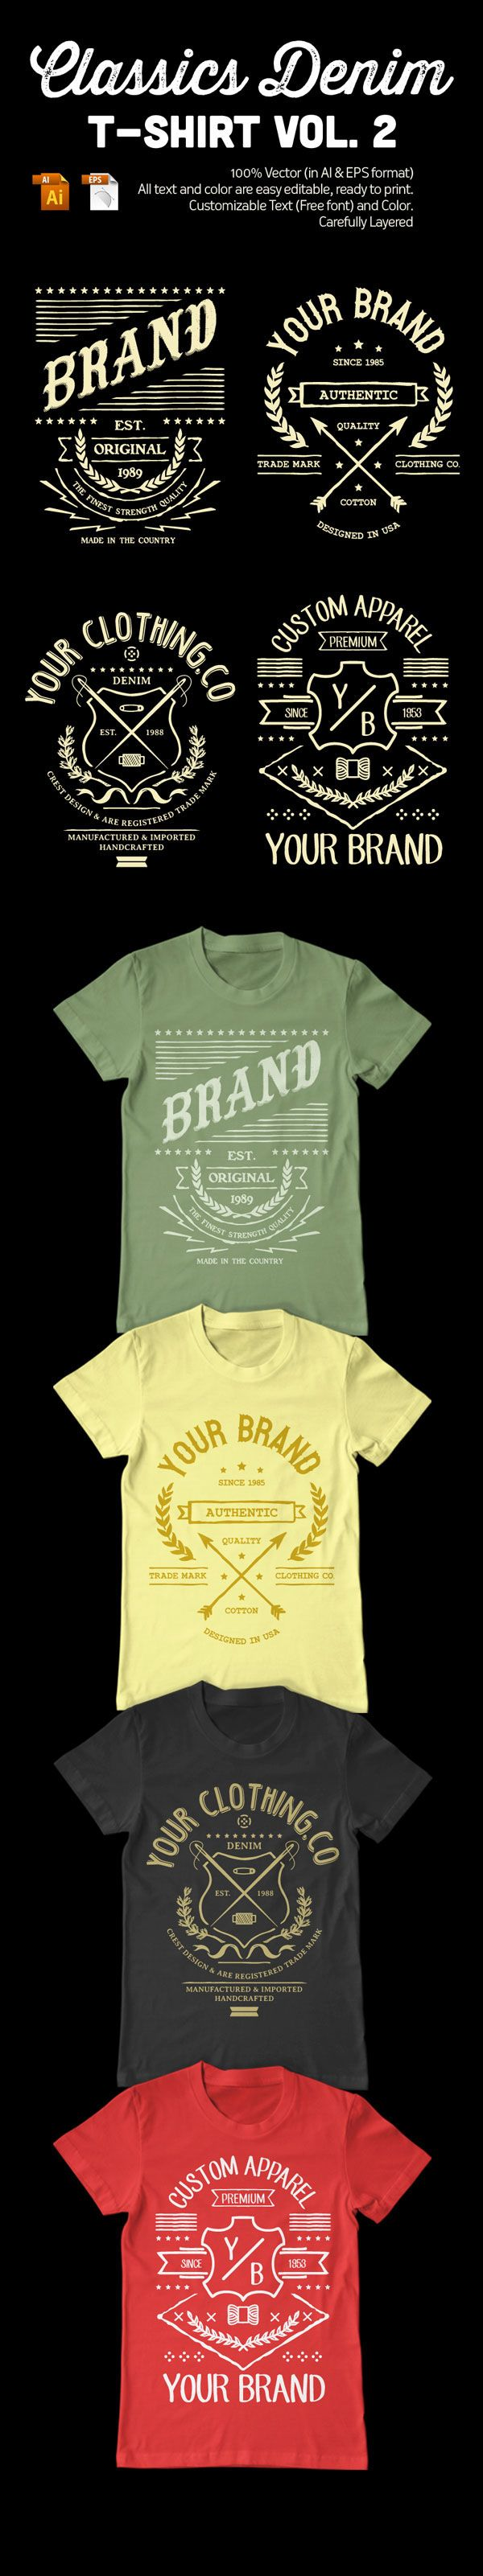 Design t shirt online template - Vintage T Shirt Design Template On Behance